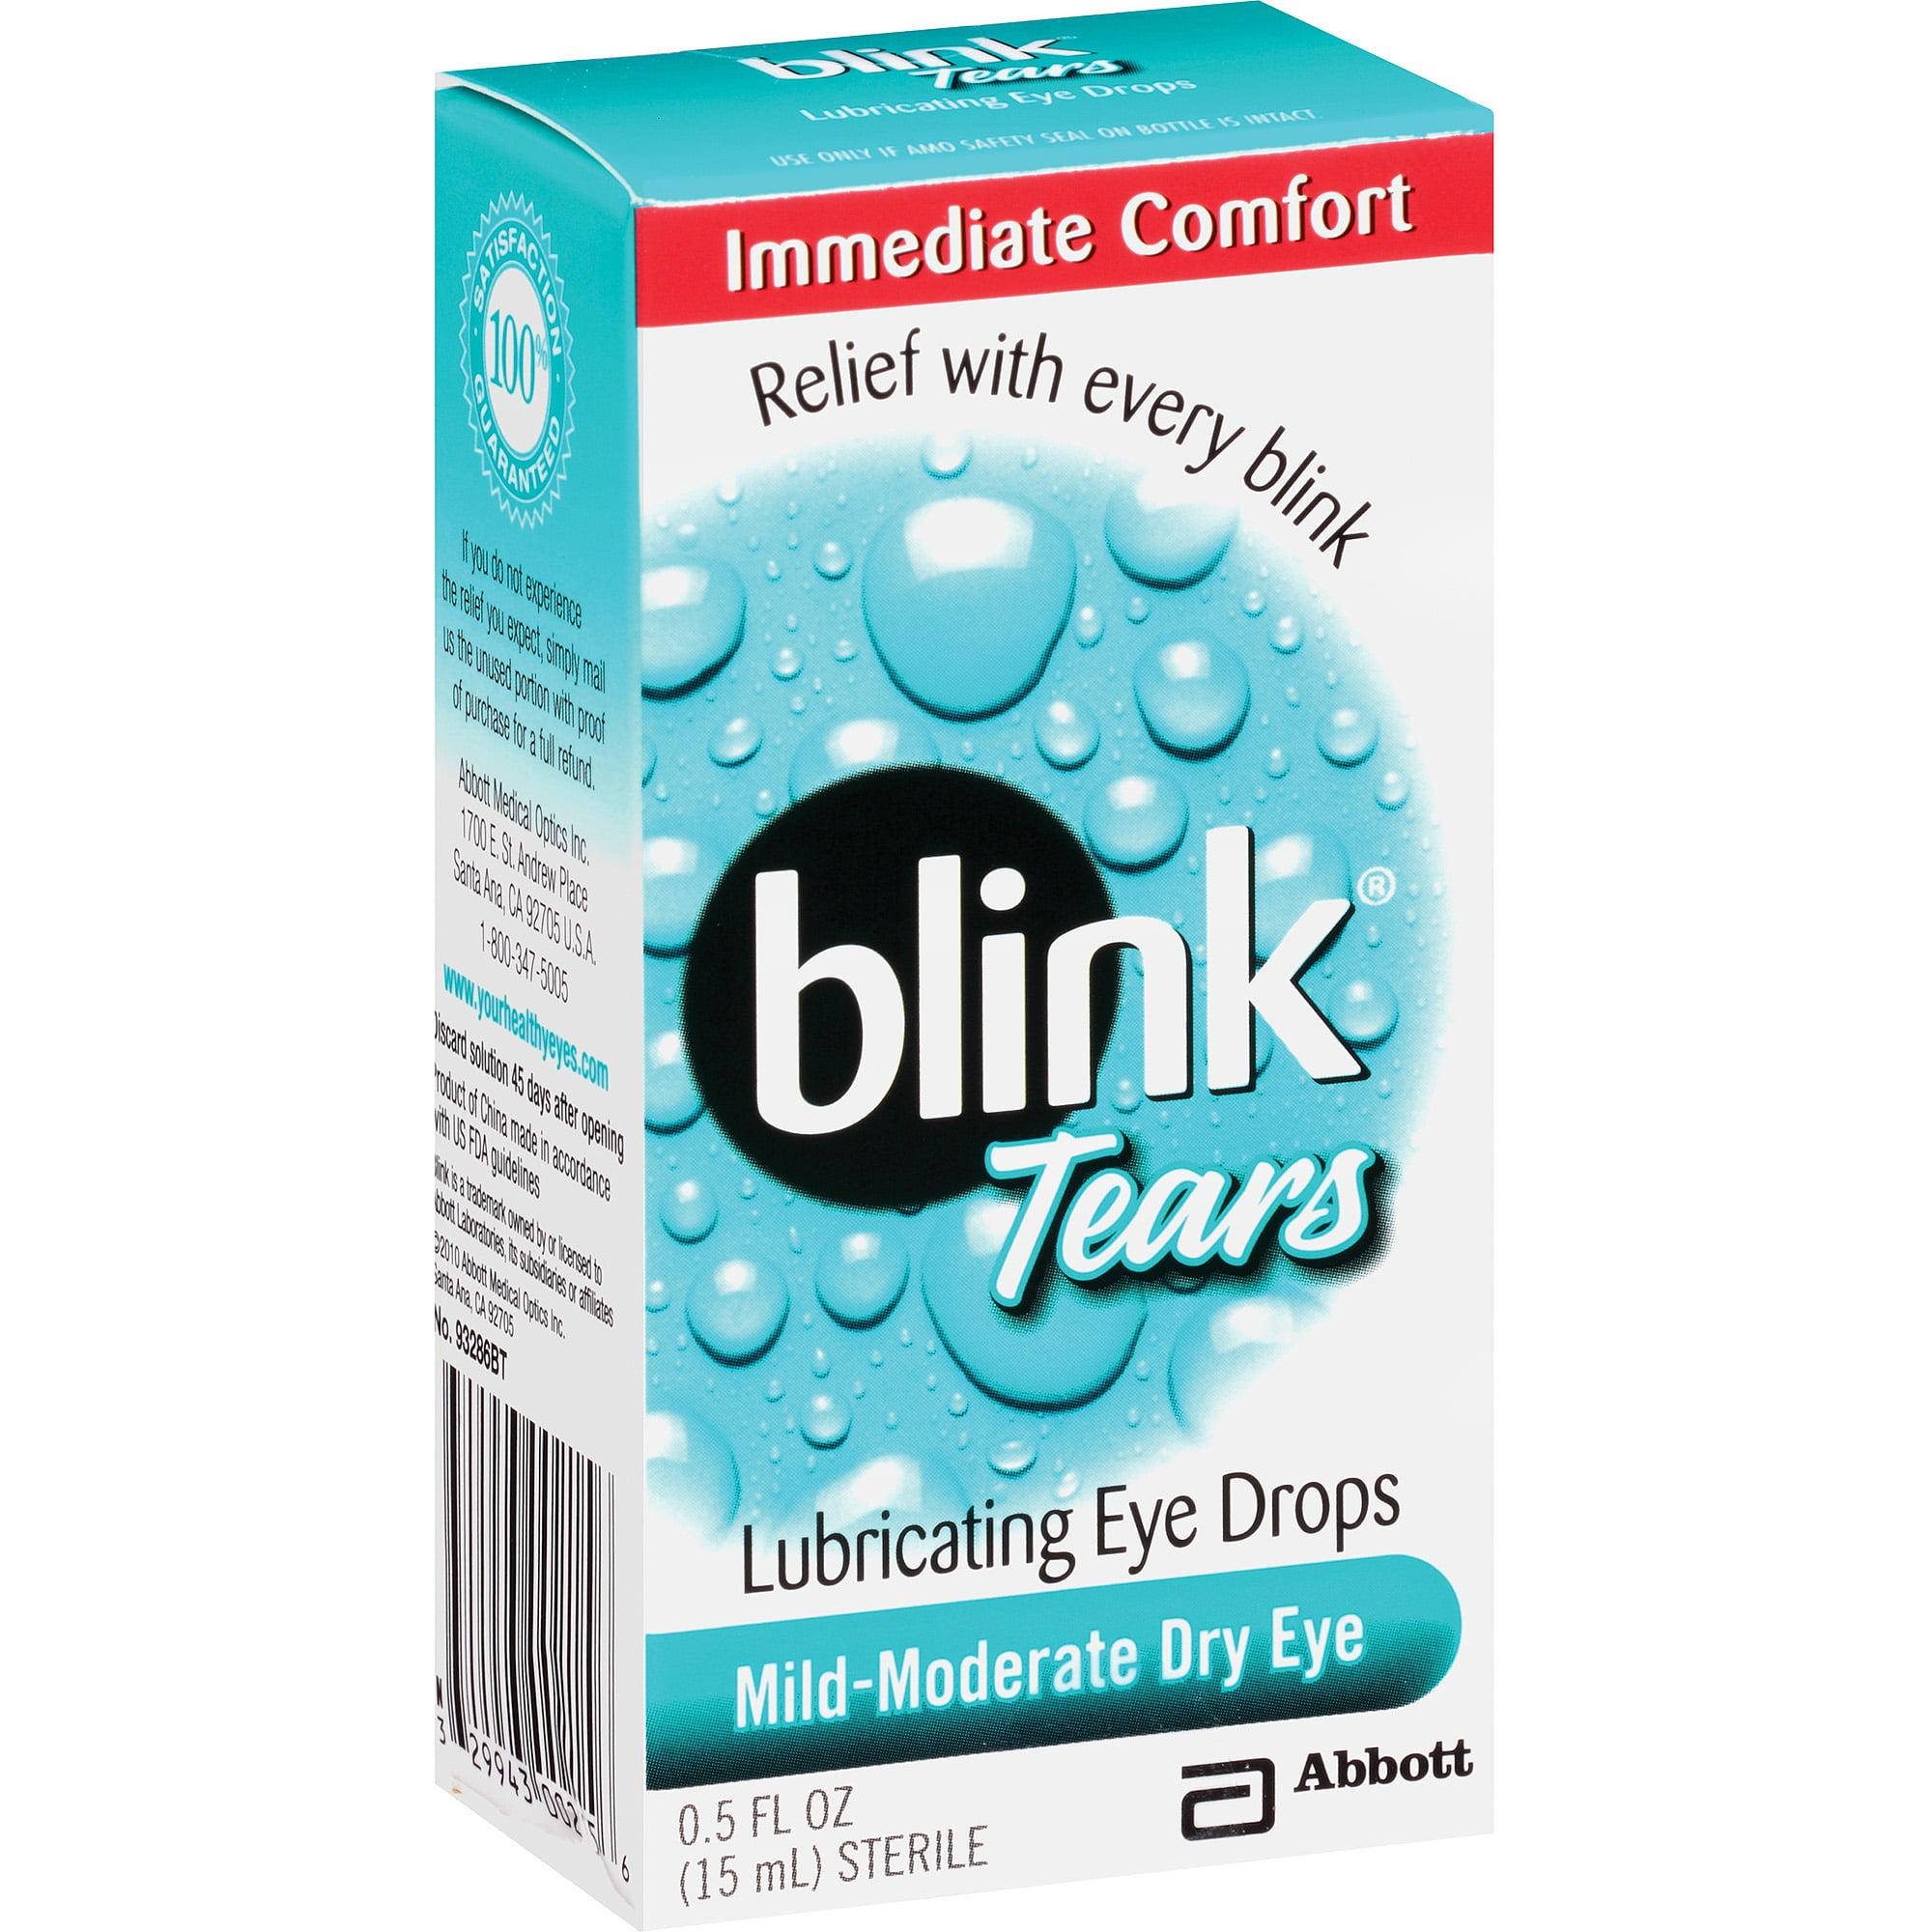 Blink Tears Lubricating Eye Drops, 0.5 fl oz